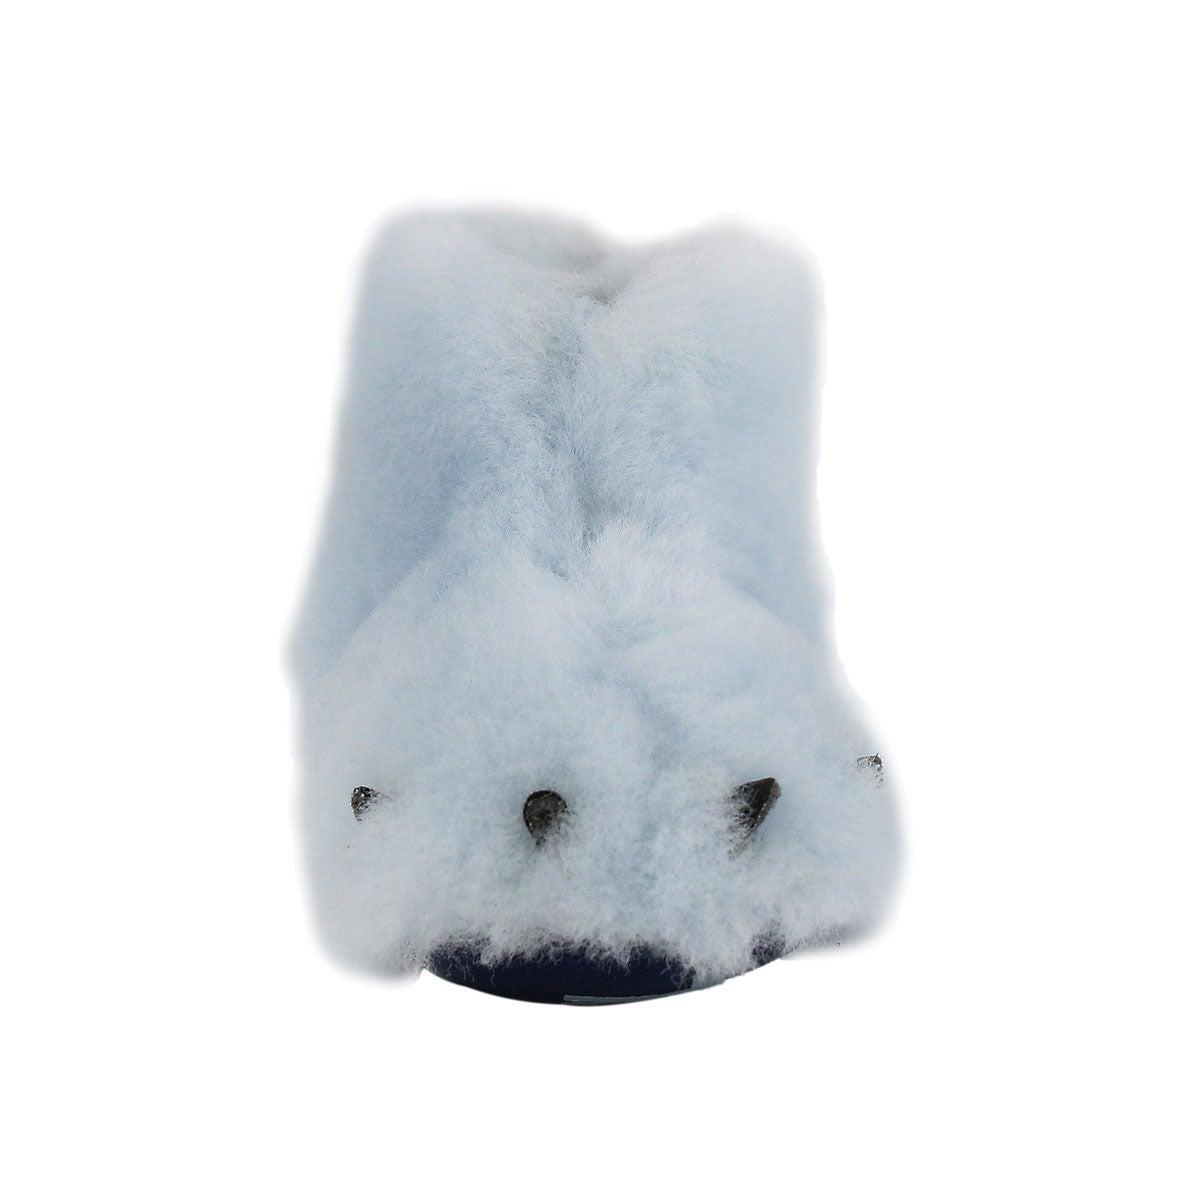 Pantoufle-bottillon Bear Paw, oxy.,bébé